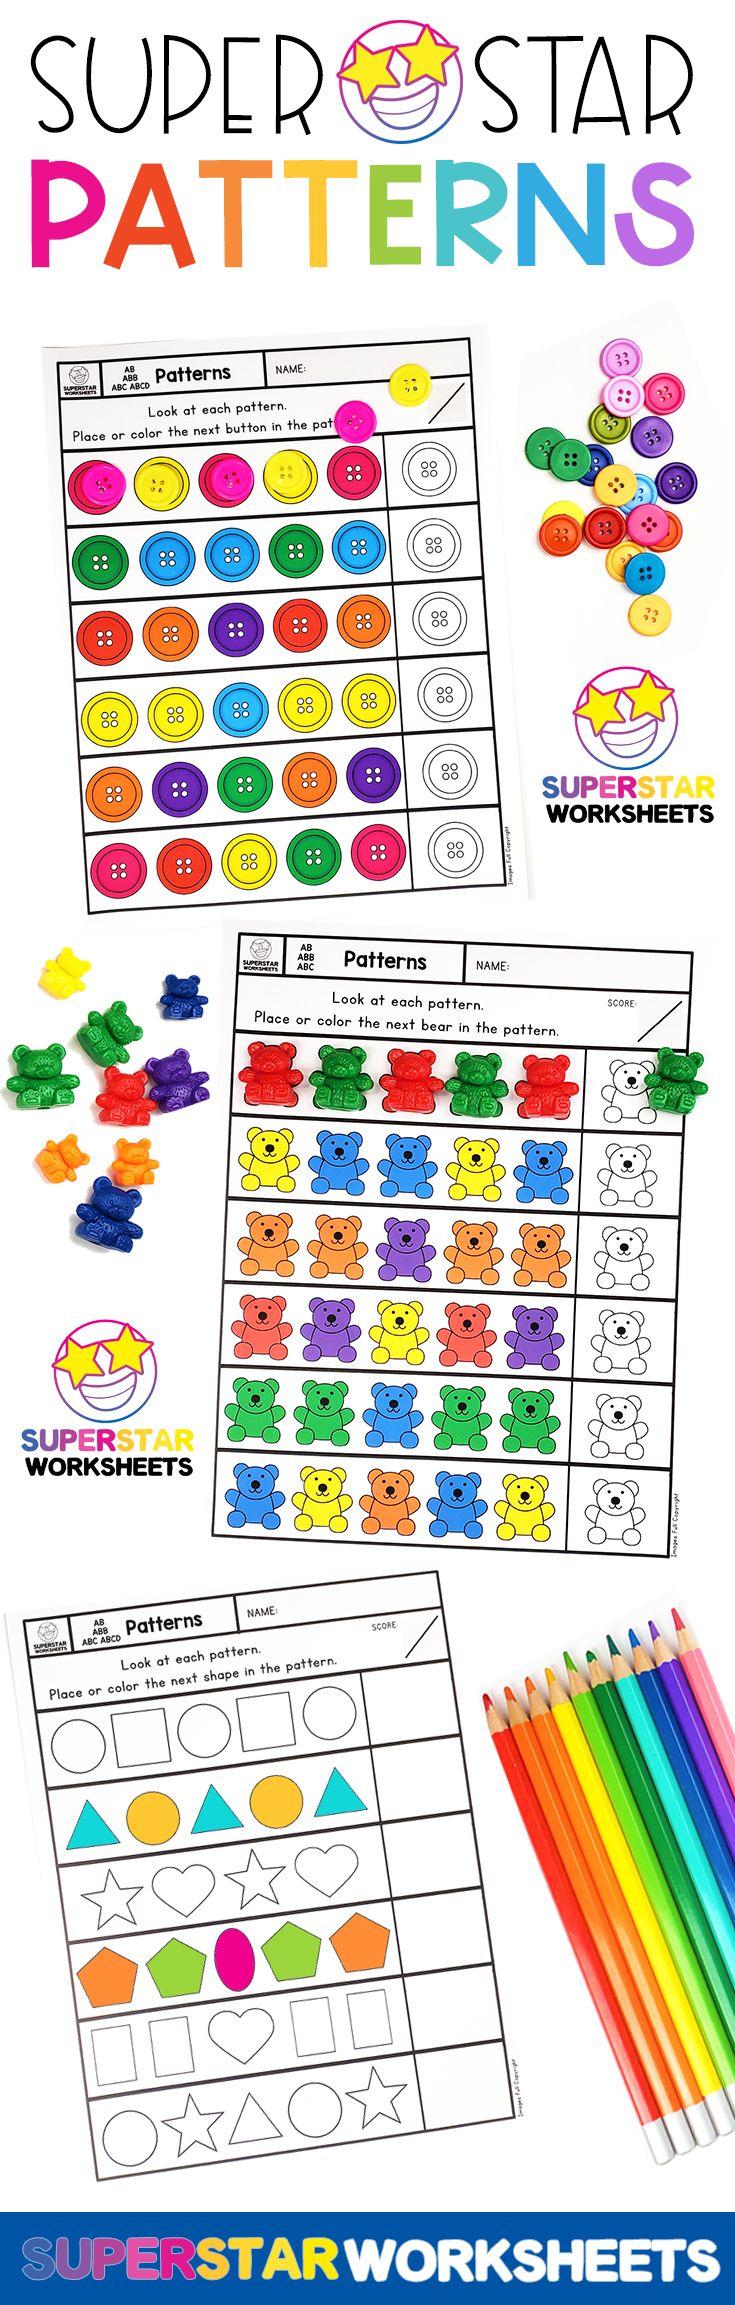 Free Pattern Worksheets Preschool Patterns Pattern Worksheet Preschool Pattern Worksheets [ 2305 x 735 Pixel ]